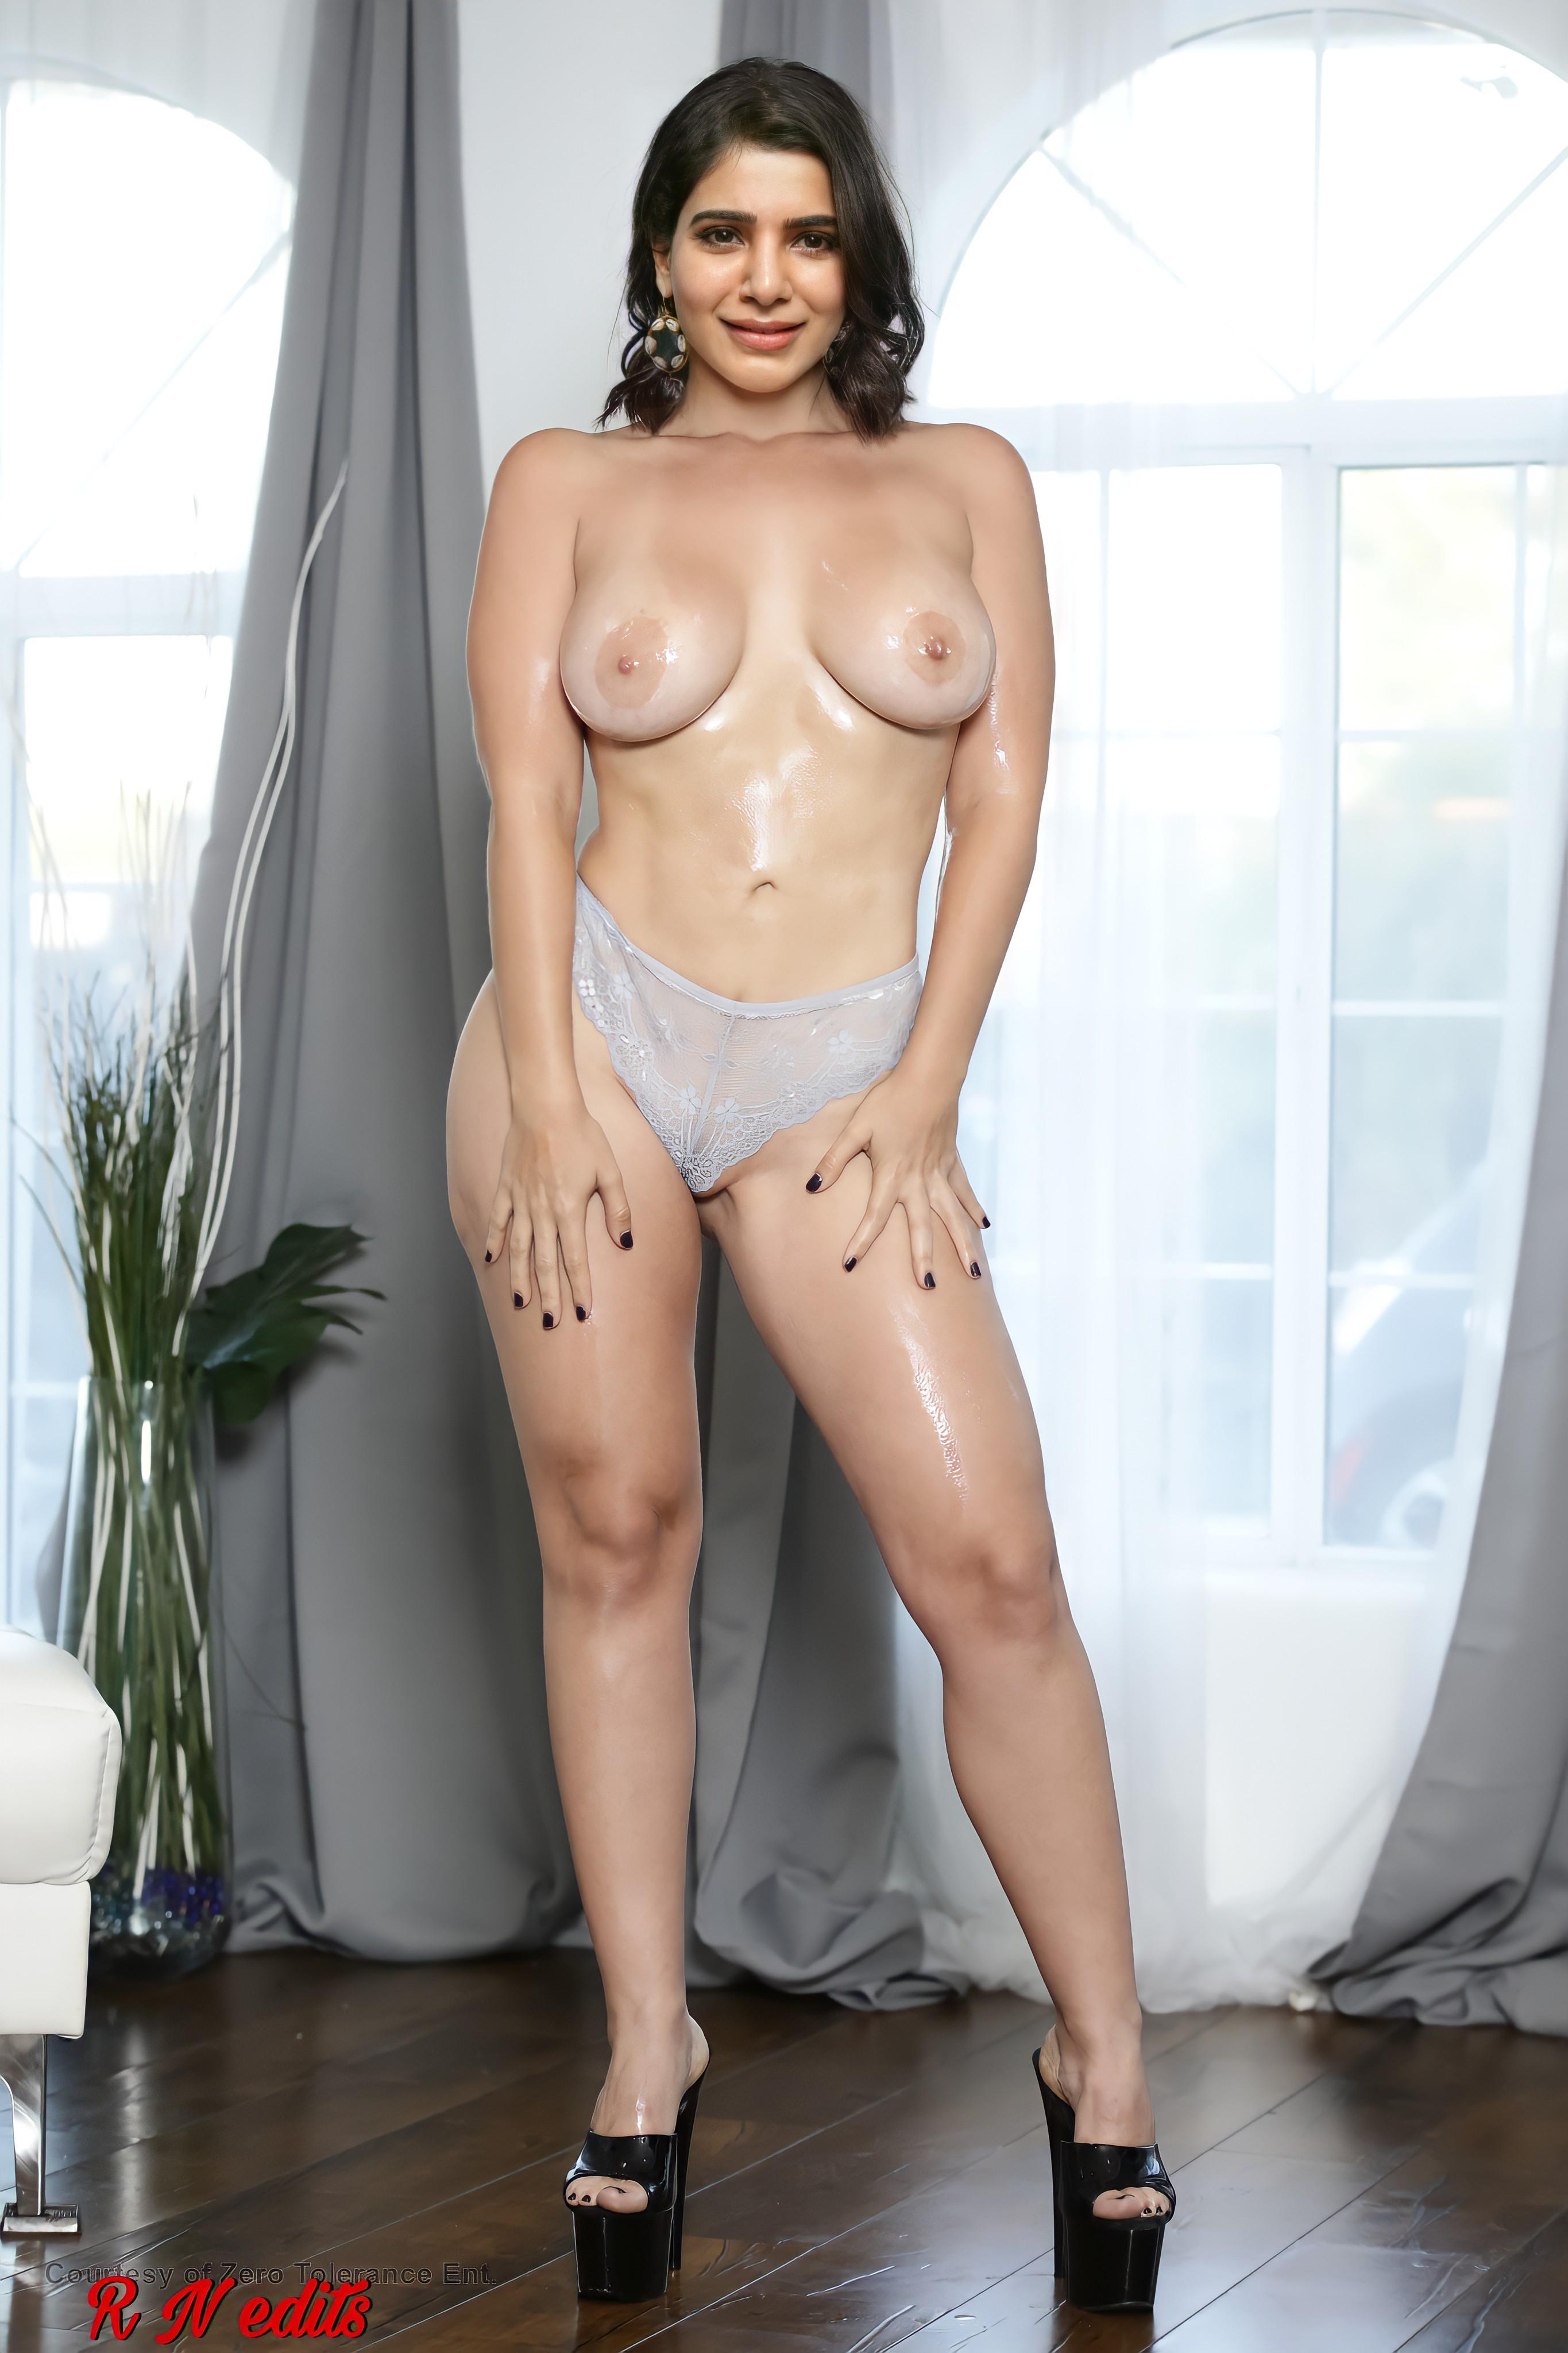 Samantha showing boobs